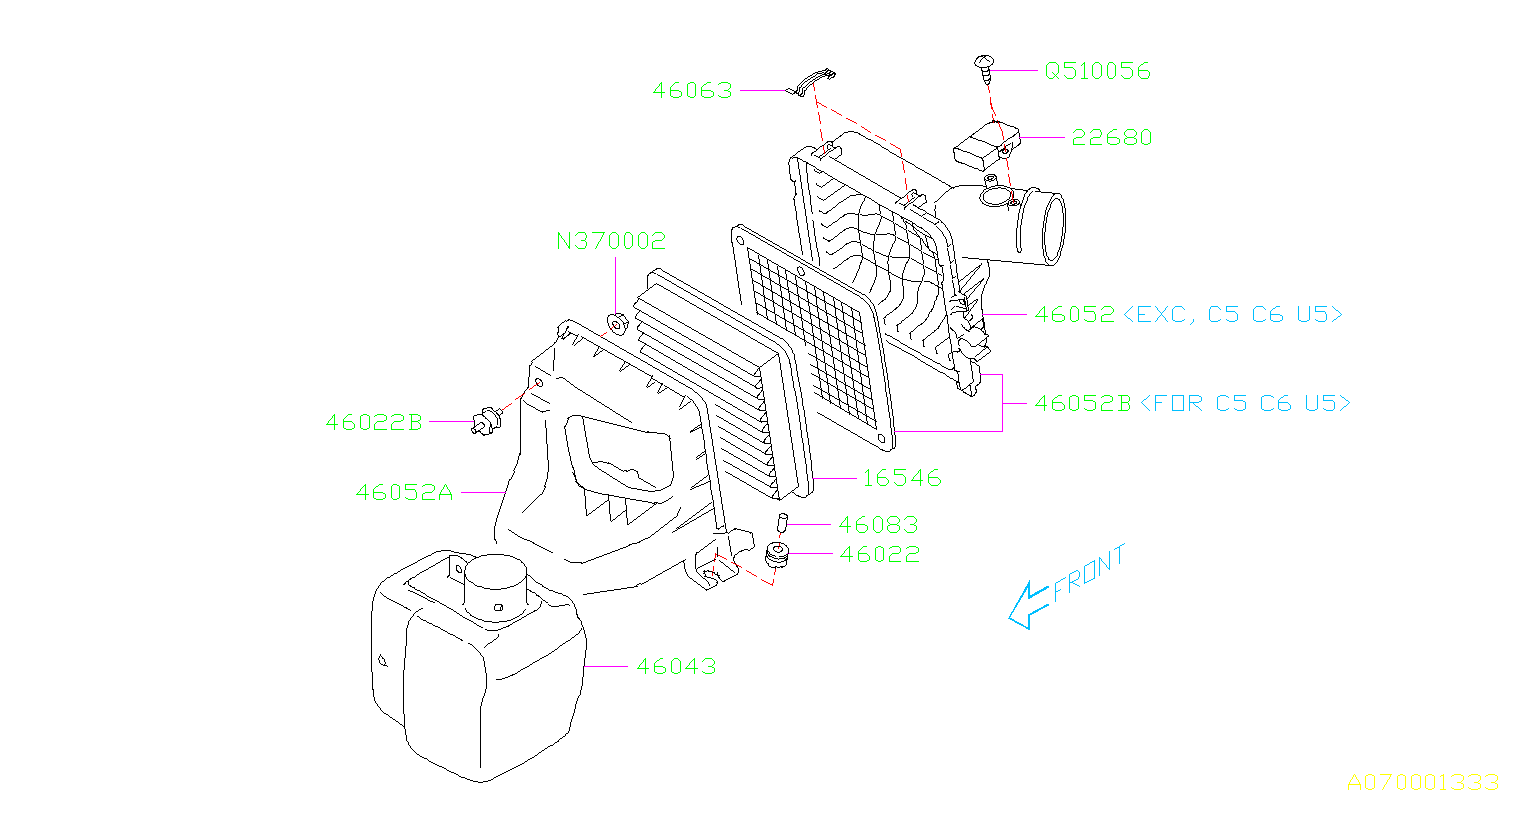 Subaru Forester Engine Air Intake Resonator Used To